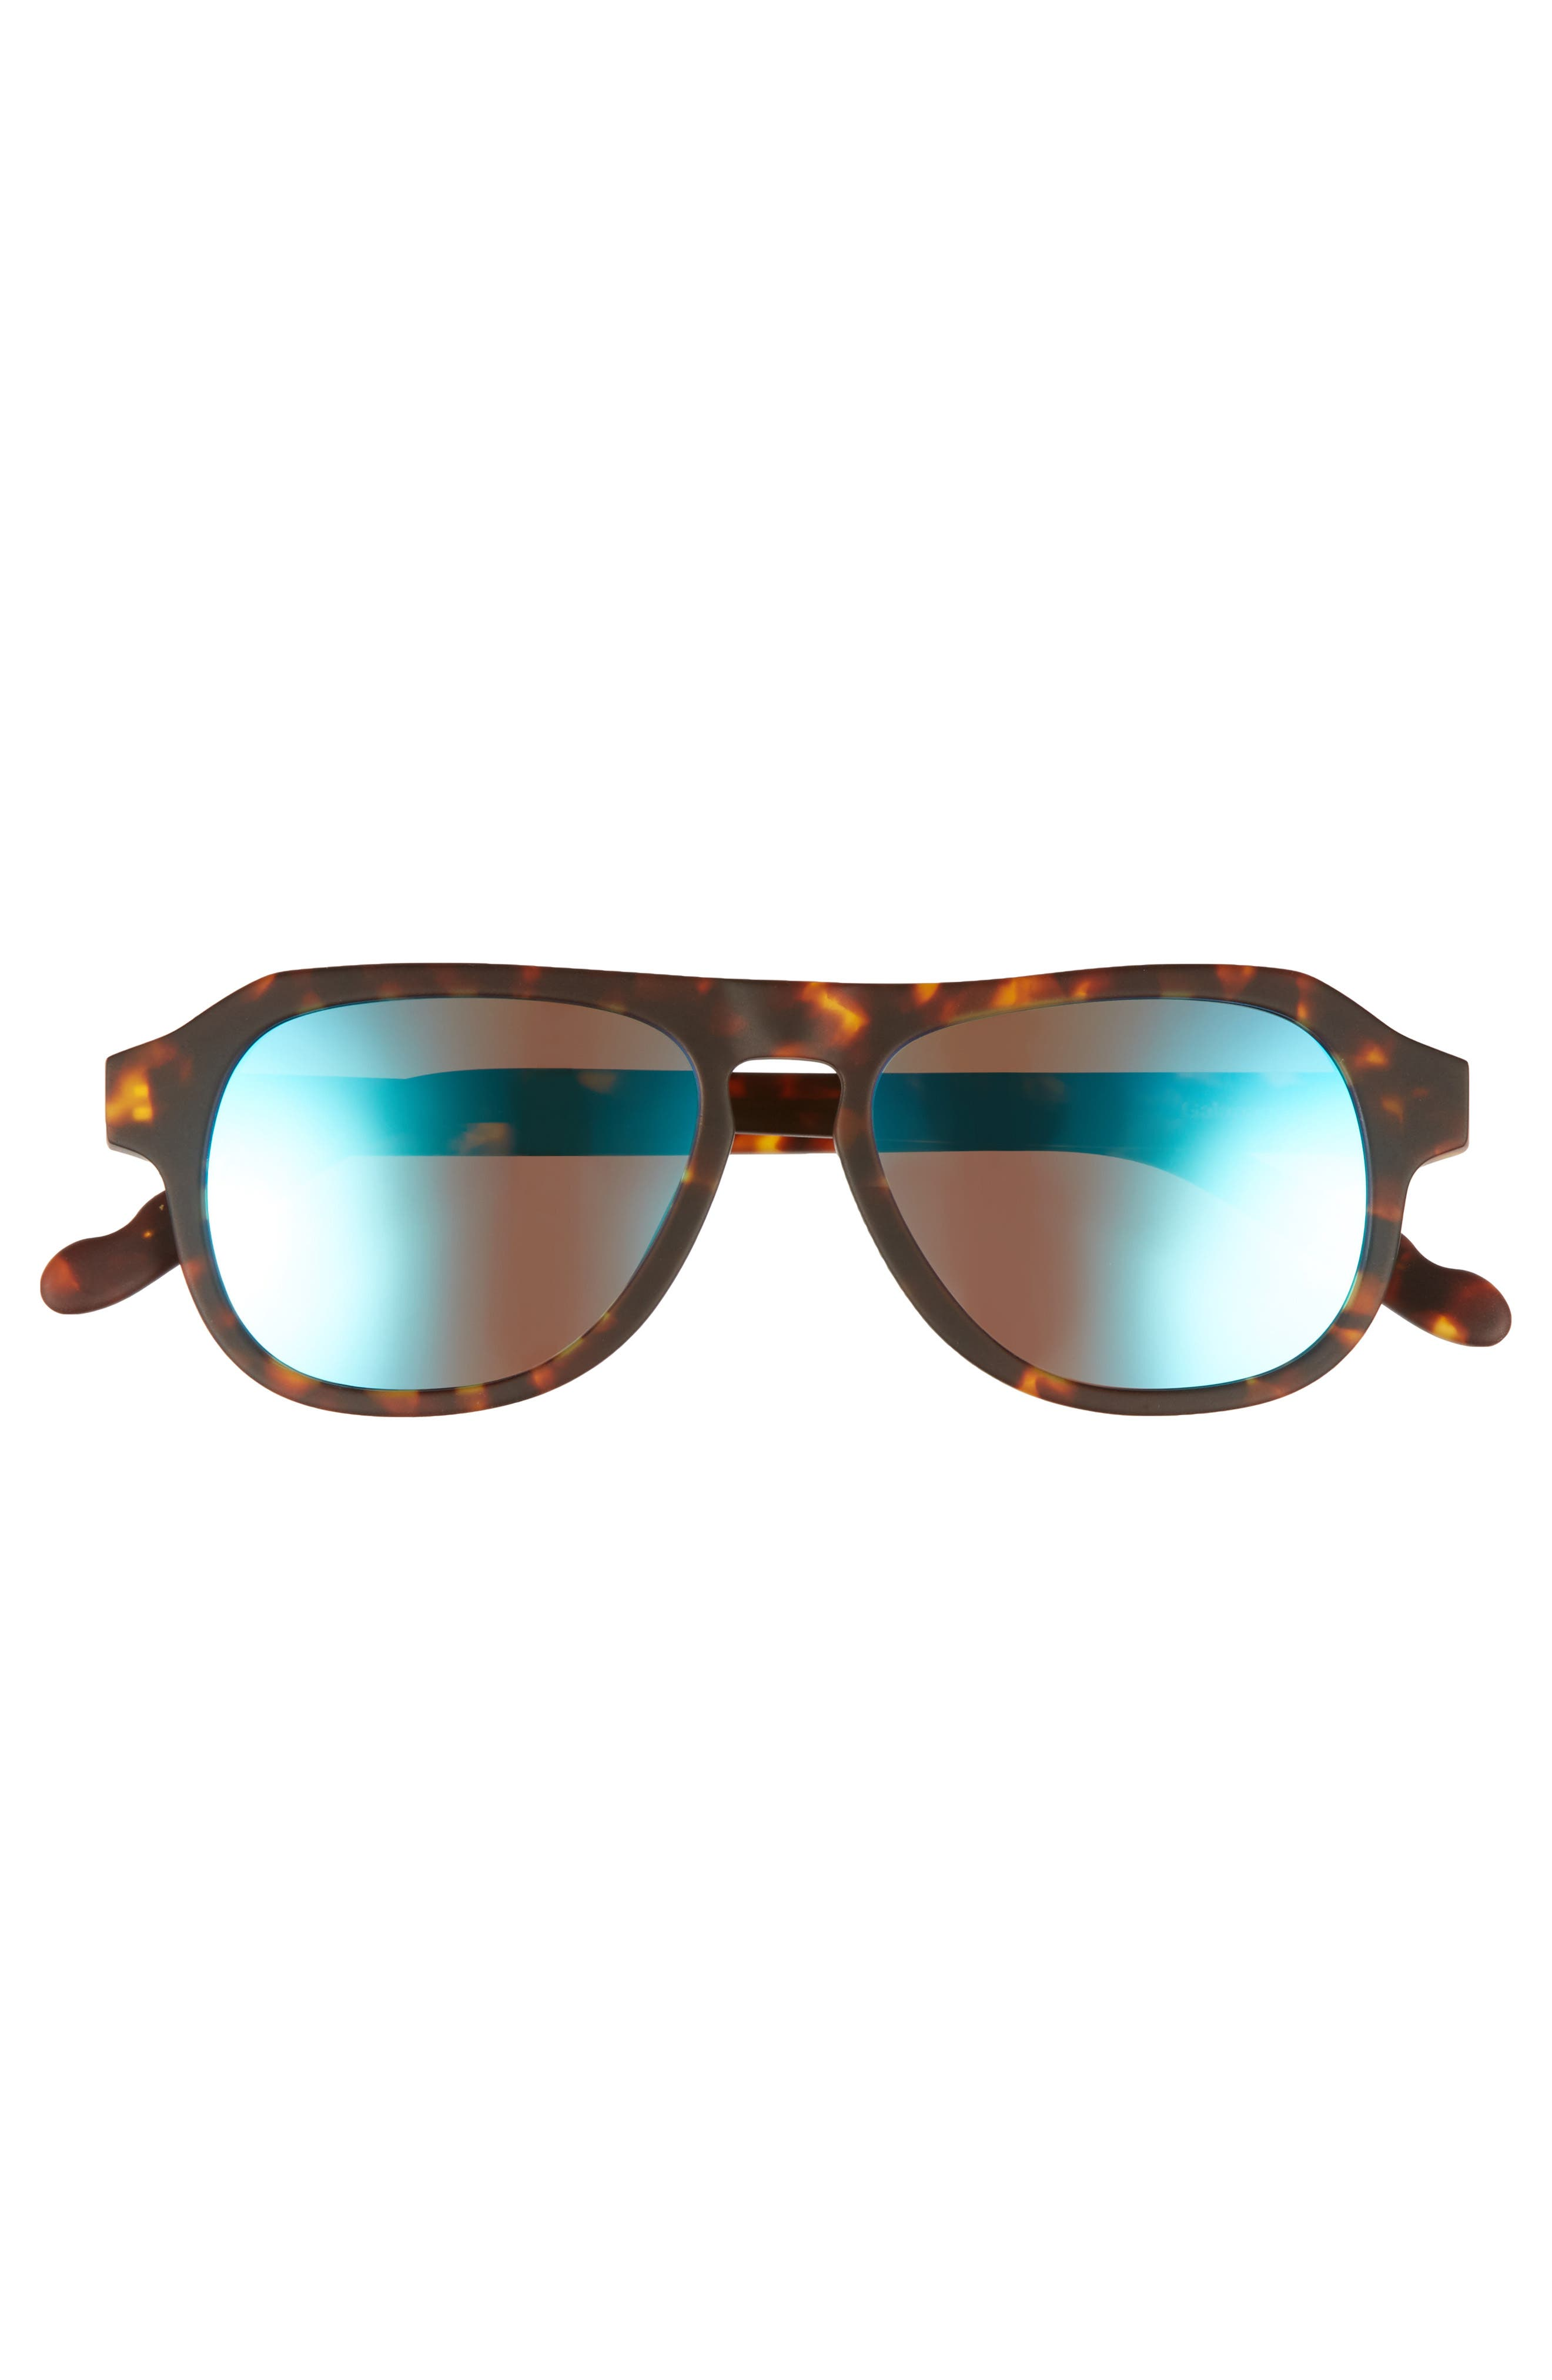 Galapagos 48mm Polarized Flat Top Sunglasses,                             Alternate thumbnail 3, color,                             Java